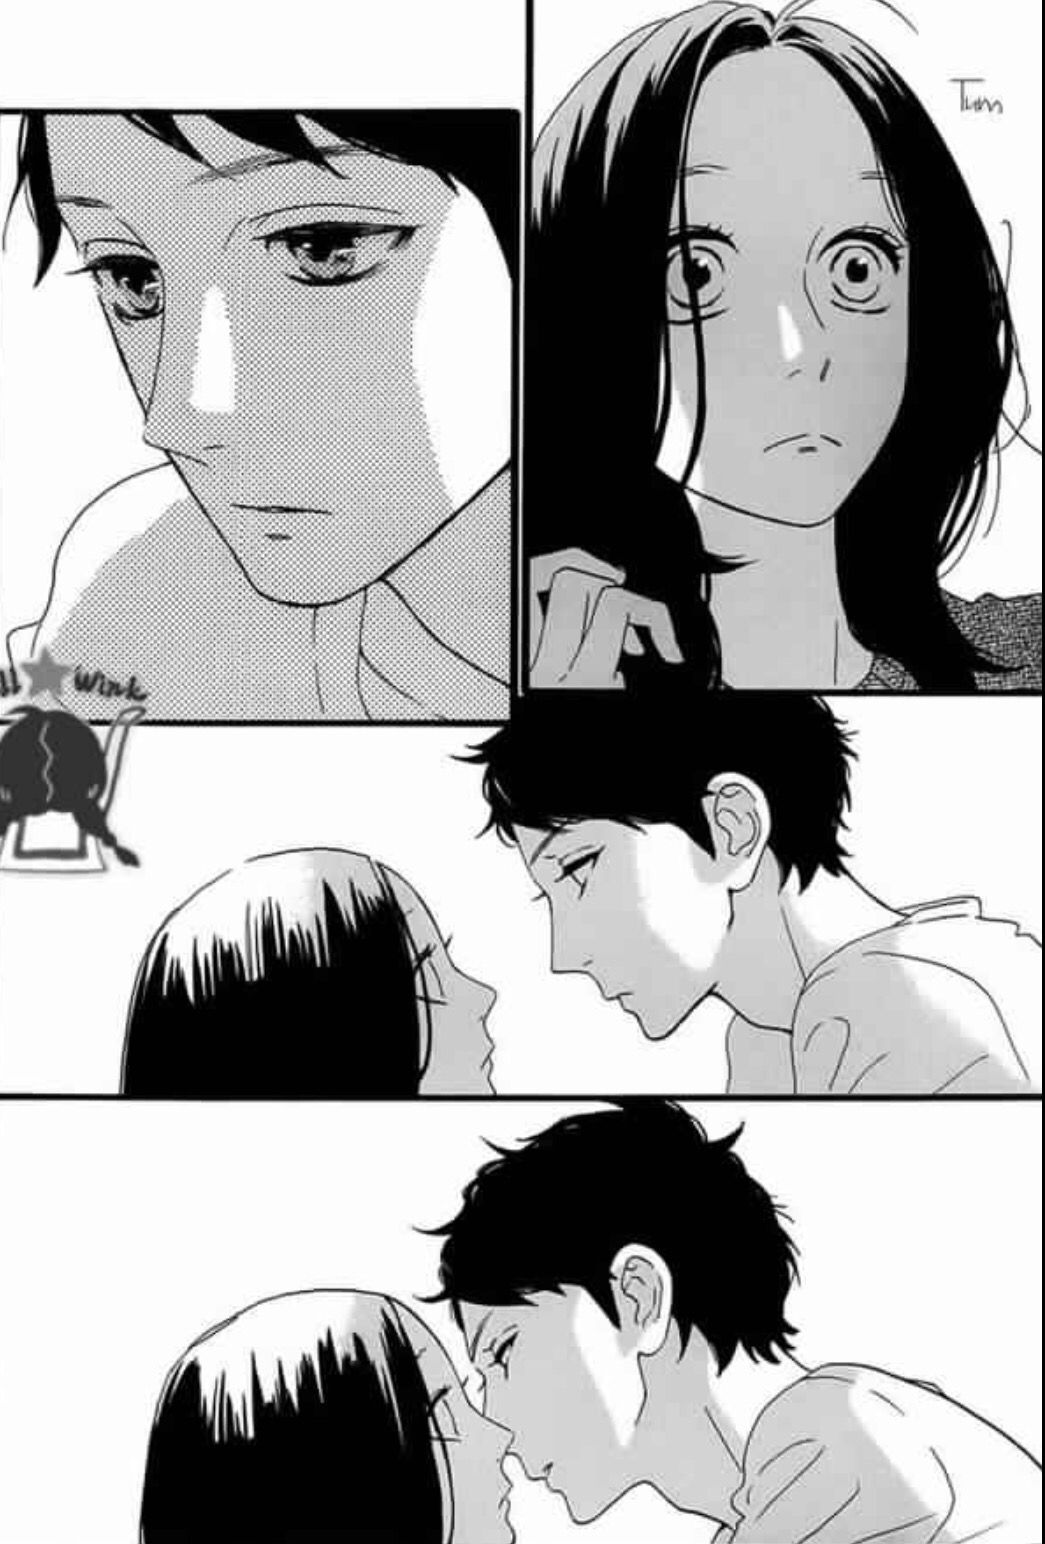 student teacher relationship shoujo manga mangahere